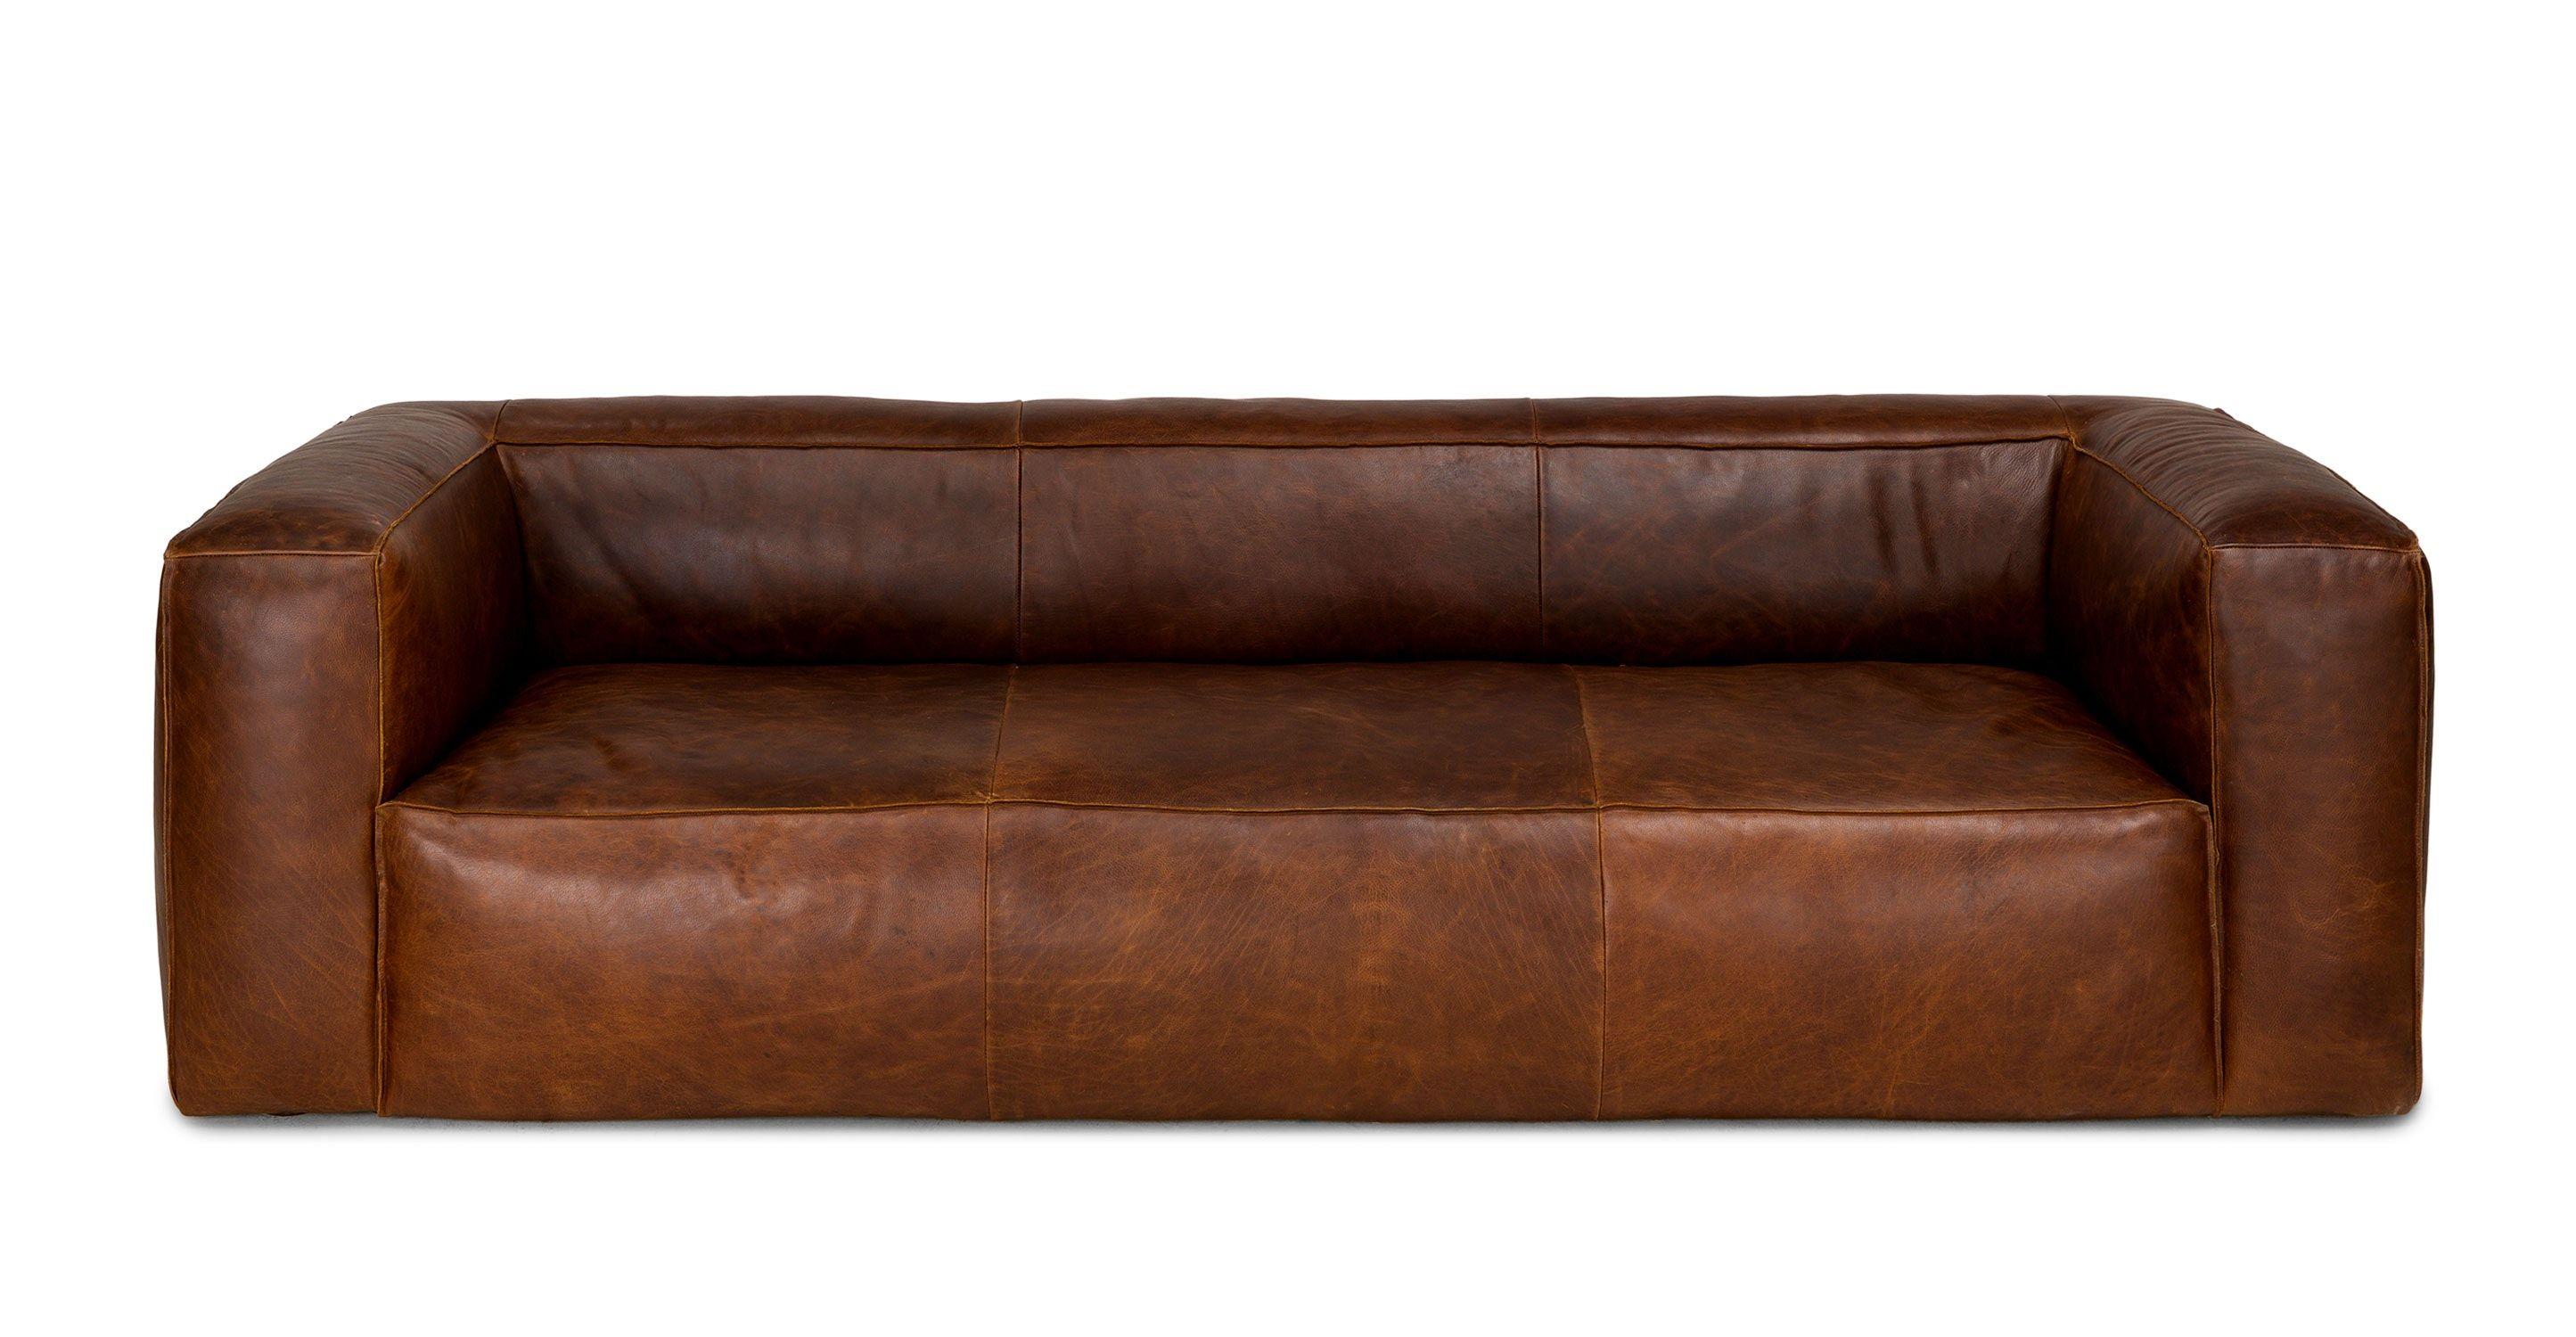 Cigar Rawhide Brown Sofa In 2020 Brown Leather Sofa Brown Sofa Brown Living Room Decor